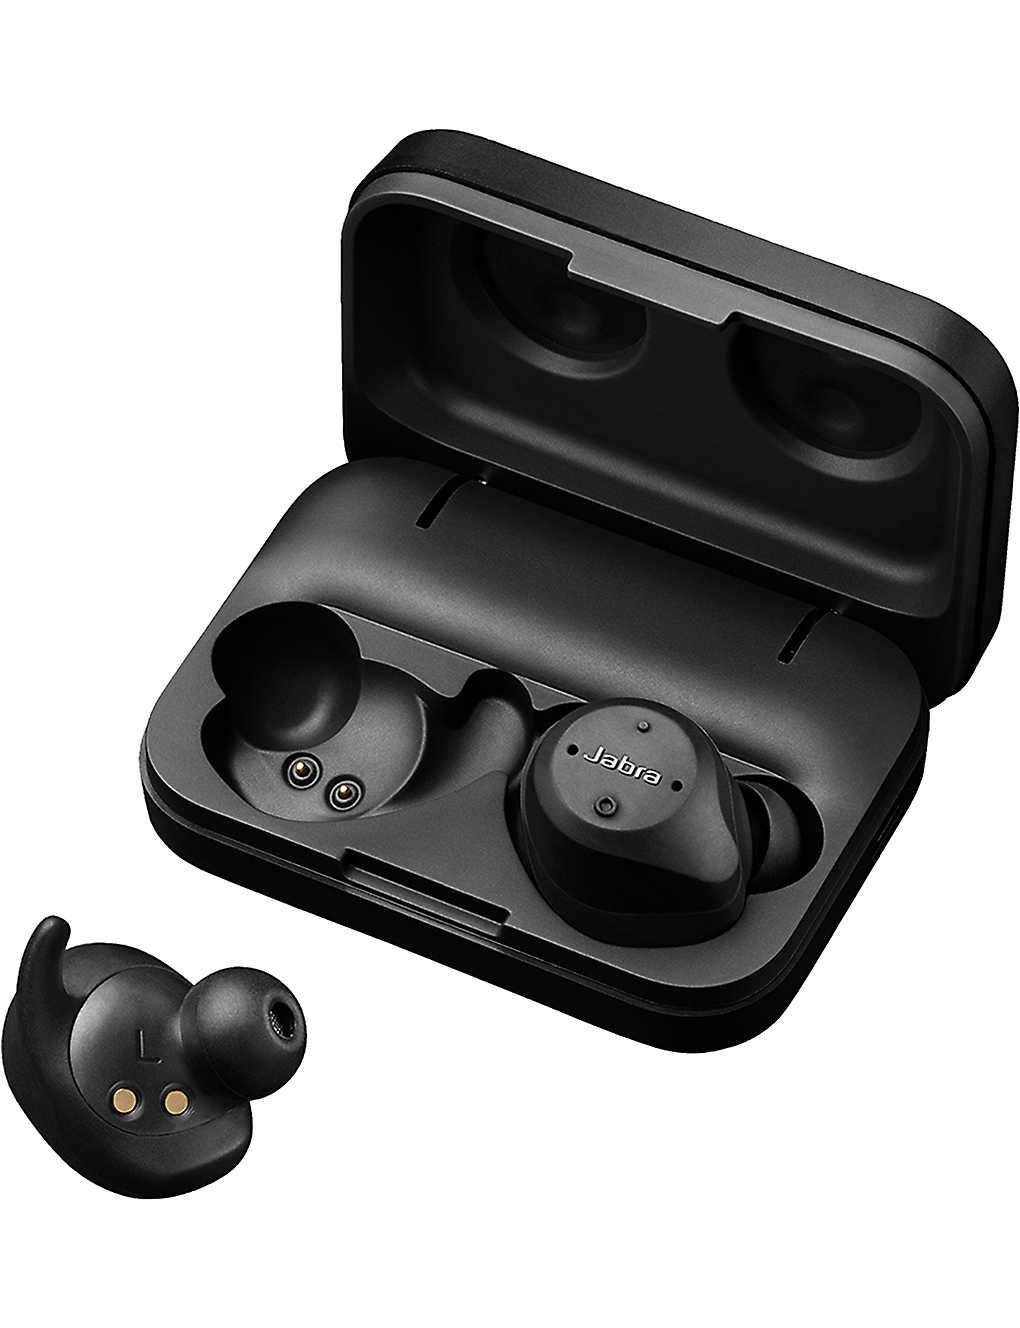 938cf741b0d JABRA - Jabra Elite Sport True Wireless Earbuds | Selfridges.com